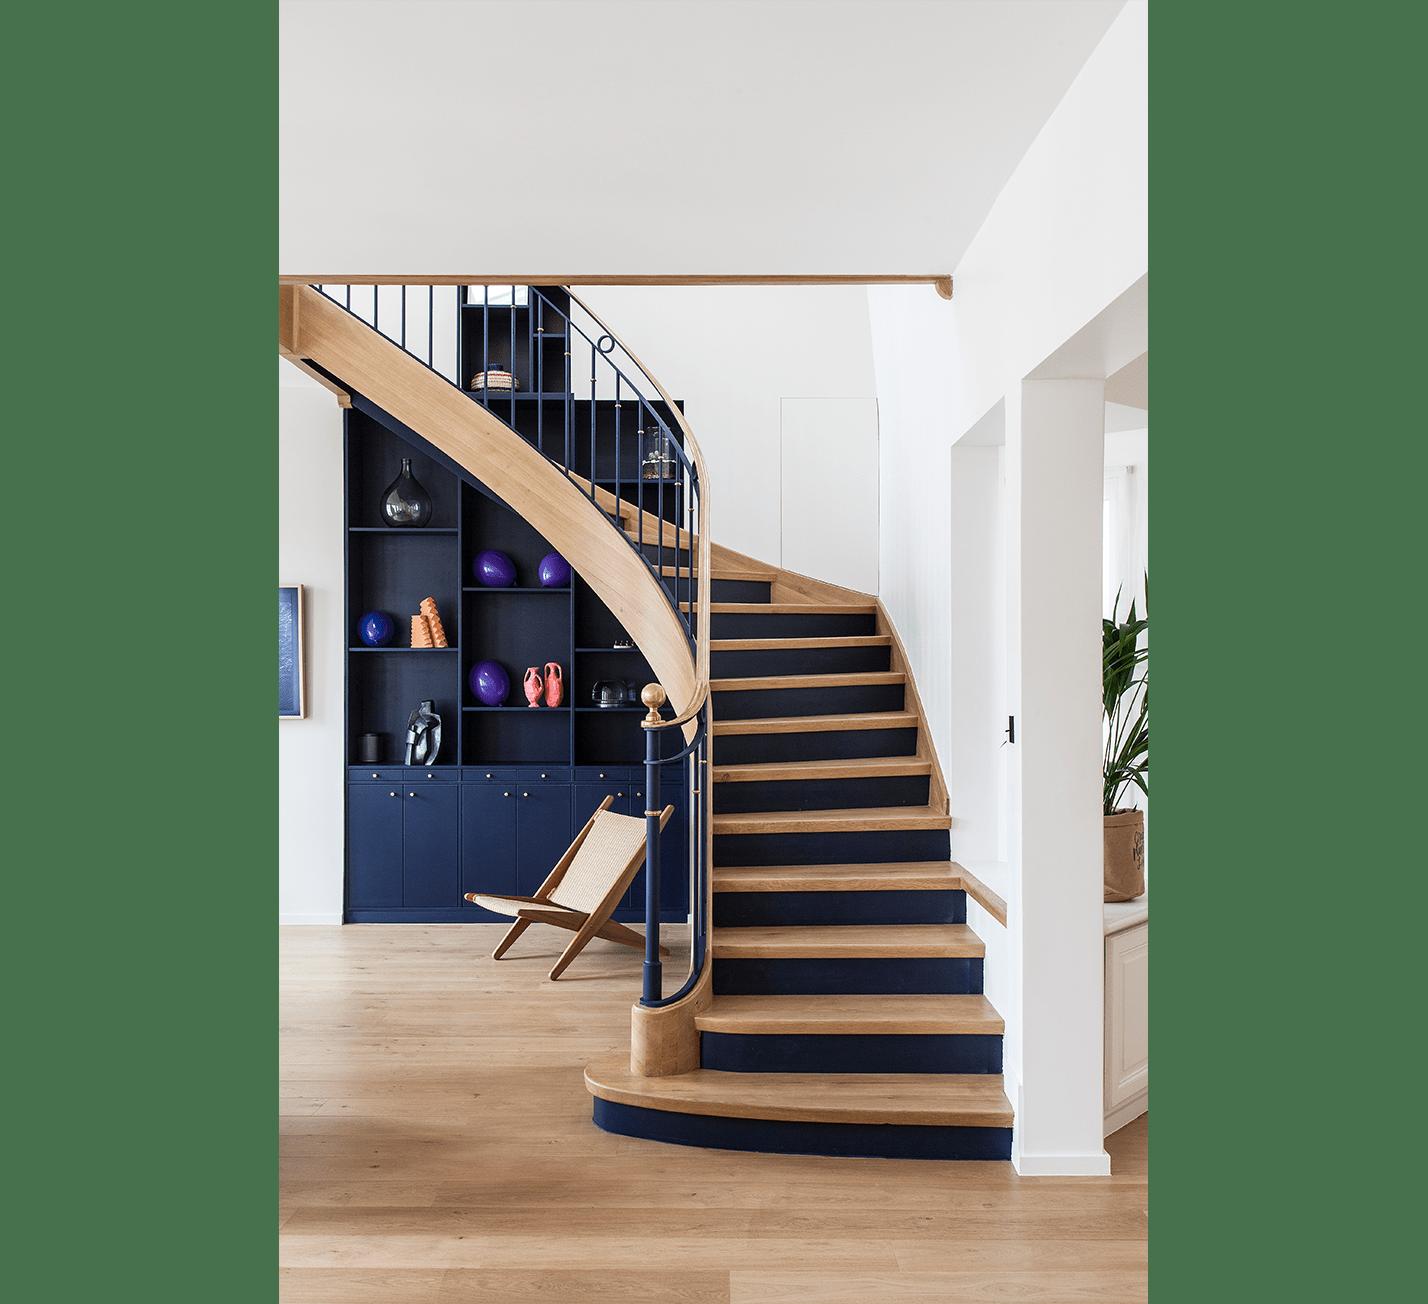 Projet-Arlequin-Atelier-Steve-Pauline-Borgia-Architecture-interieur-01-min